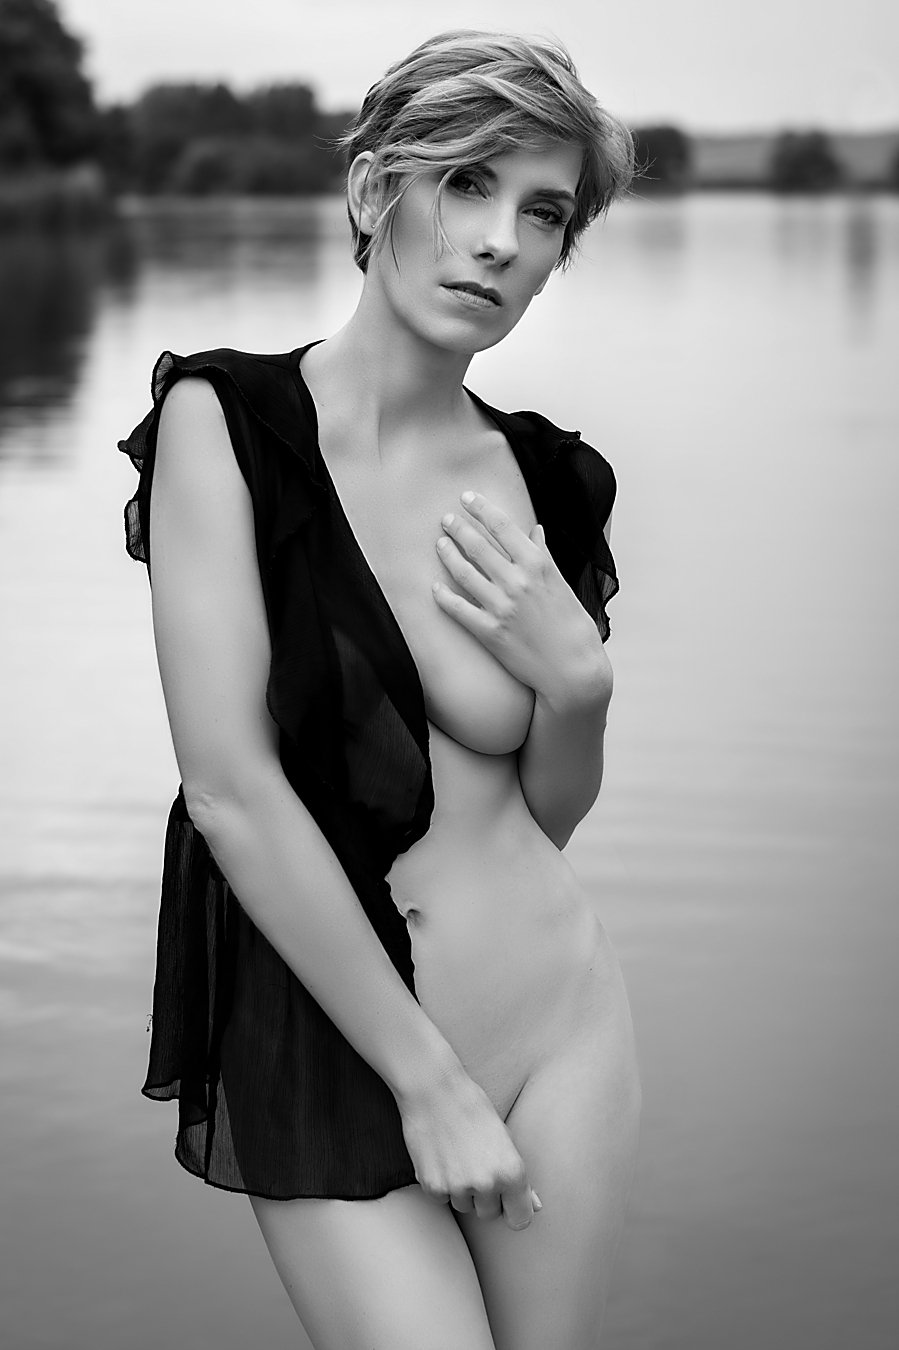 model, nude, lingerie, glamour, woman, female, black and white, body, sexy, sensual, natural light, curves, portrait, erotica, fine art, fashion,, Lajos Csáki